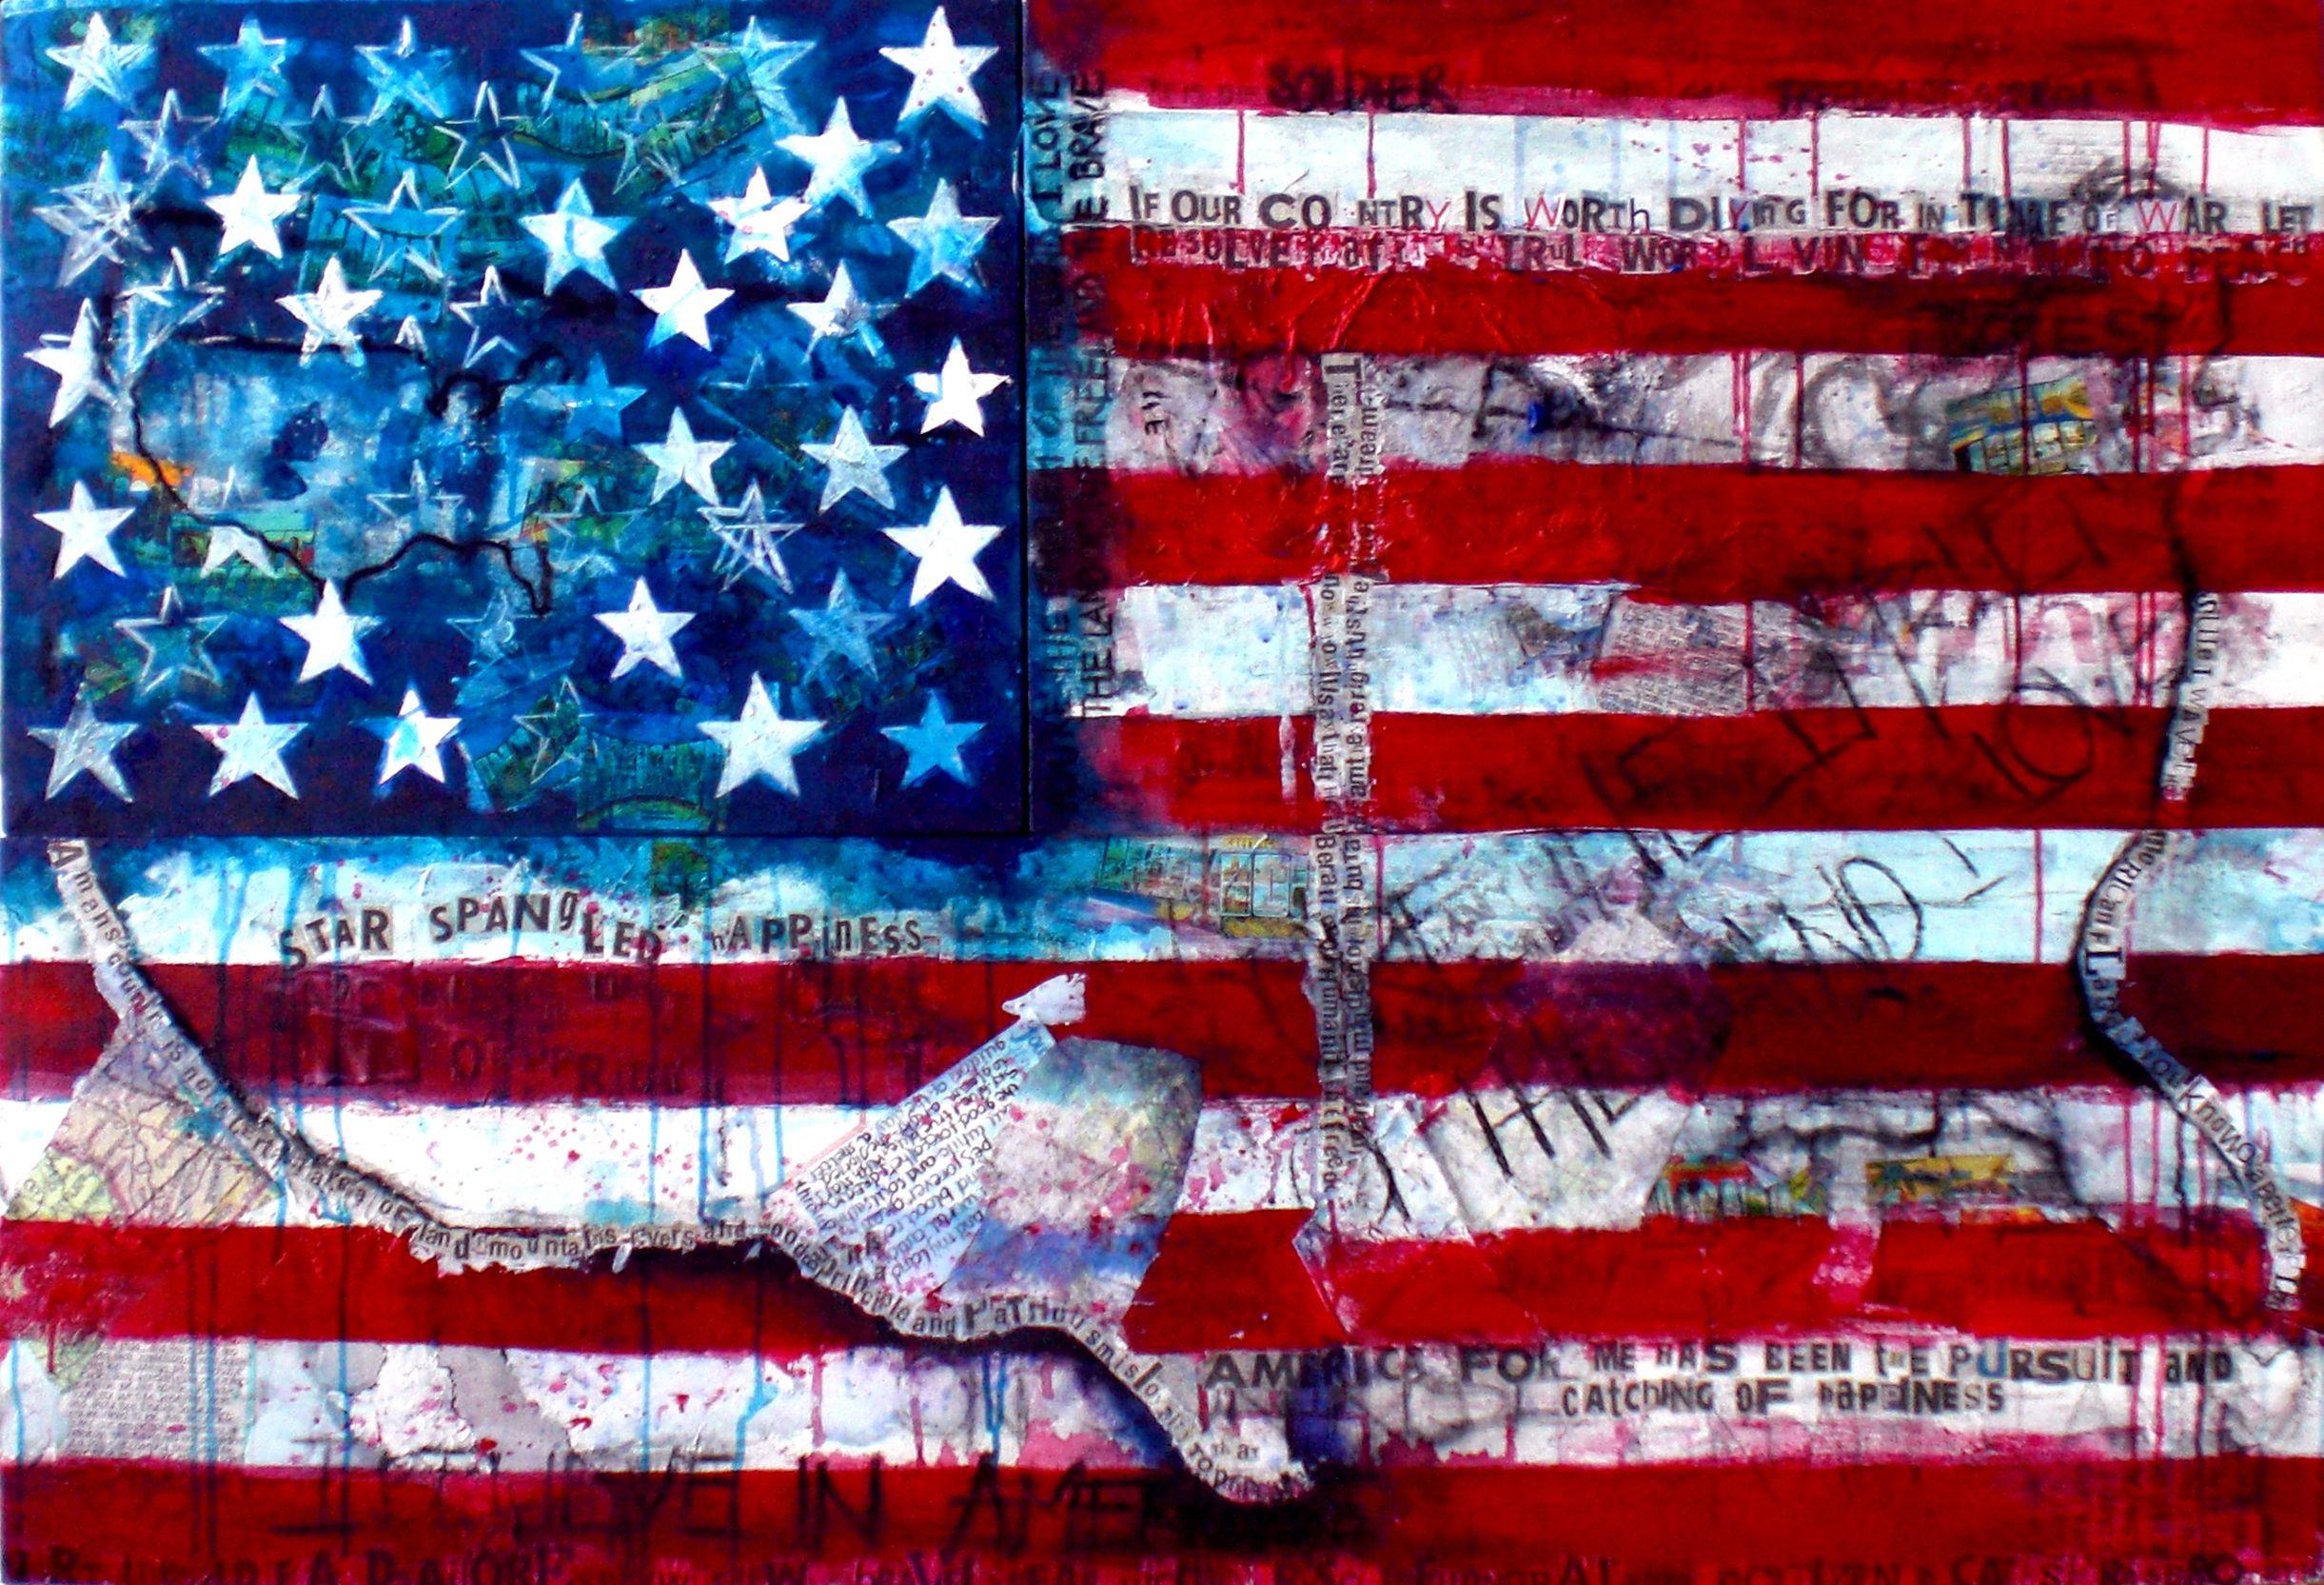 Hd wallpaper usa flag - Background Hd Wallpaper Usa Flag Art Backgrounds